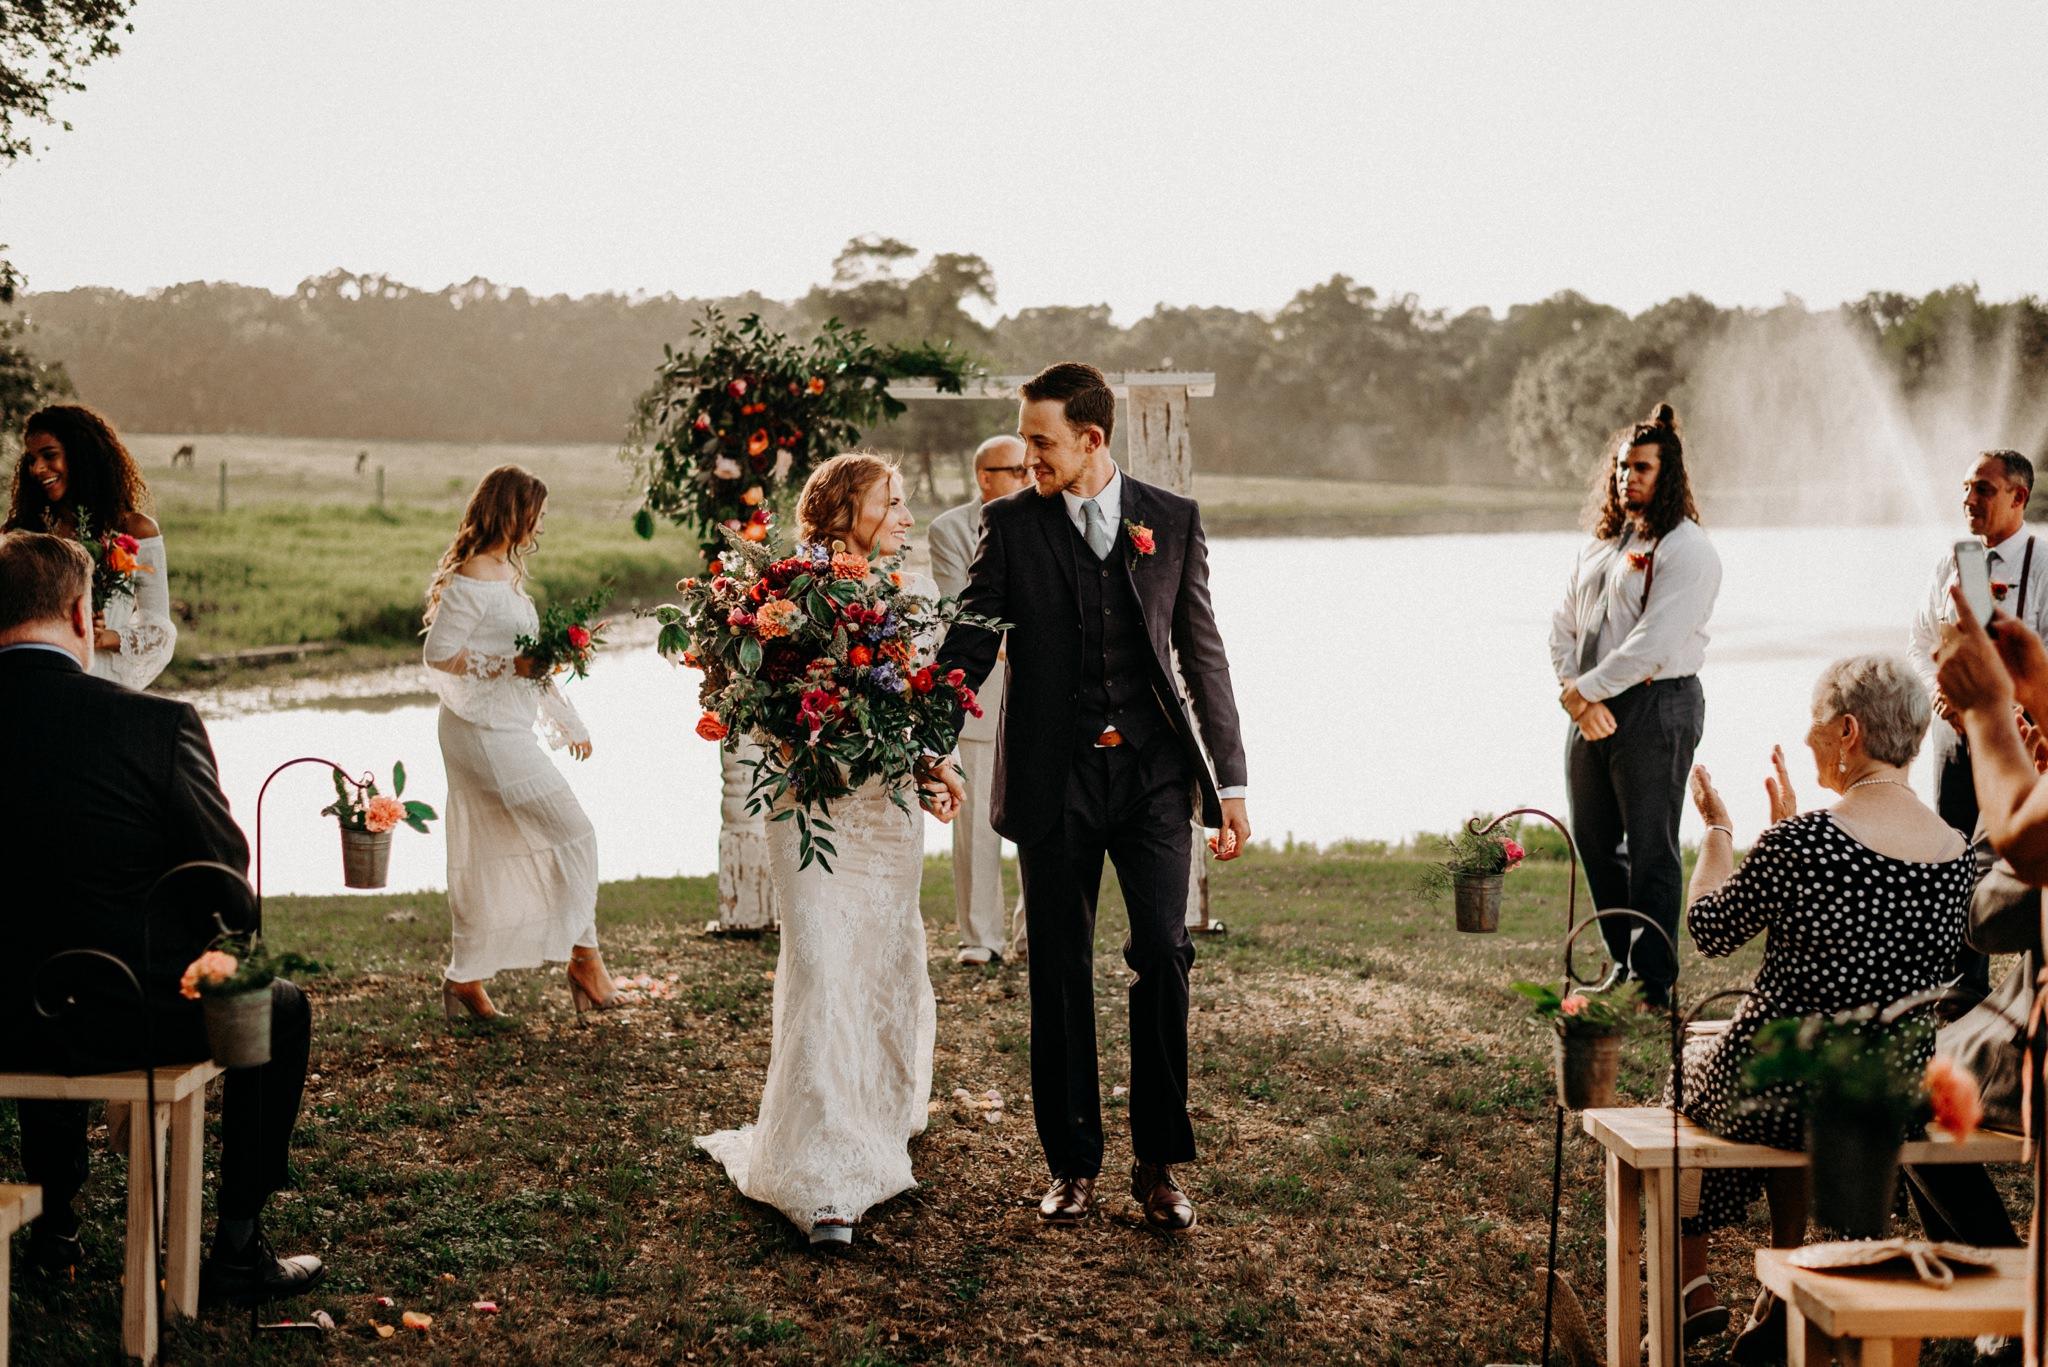 boh0-floral-greenery-lakeside-intimate-houston-wedding-kerlyn-van-gelder-photography-wedding-photographer